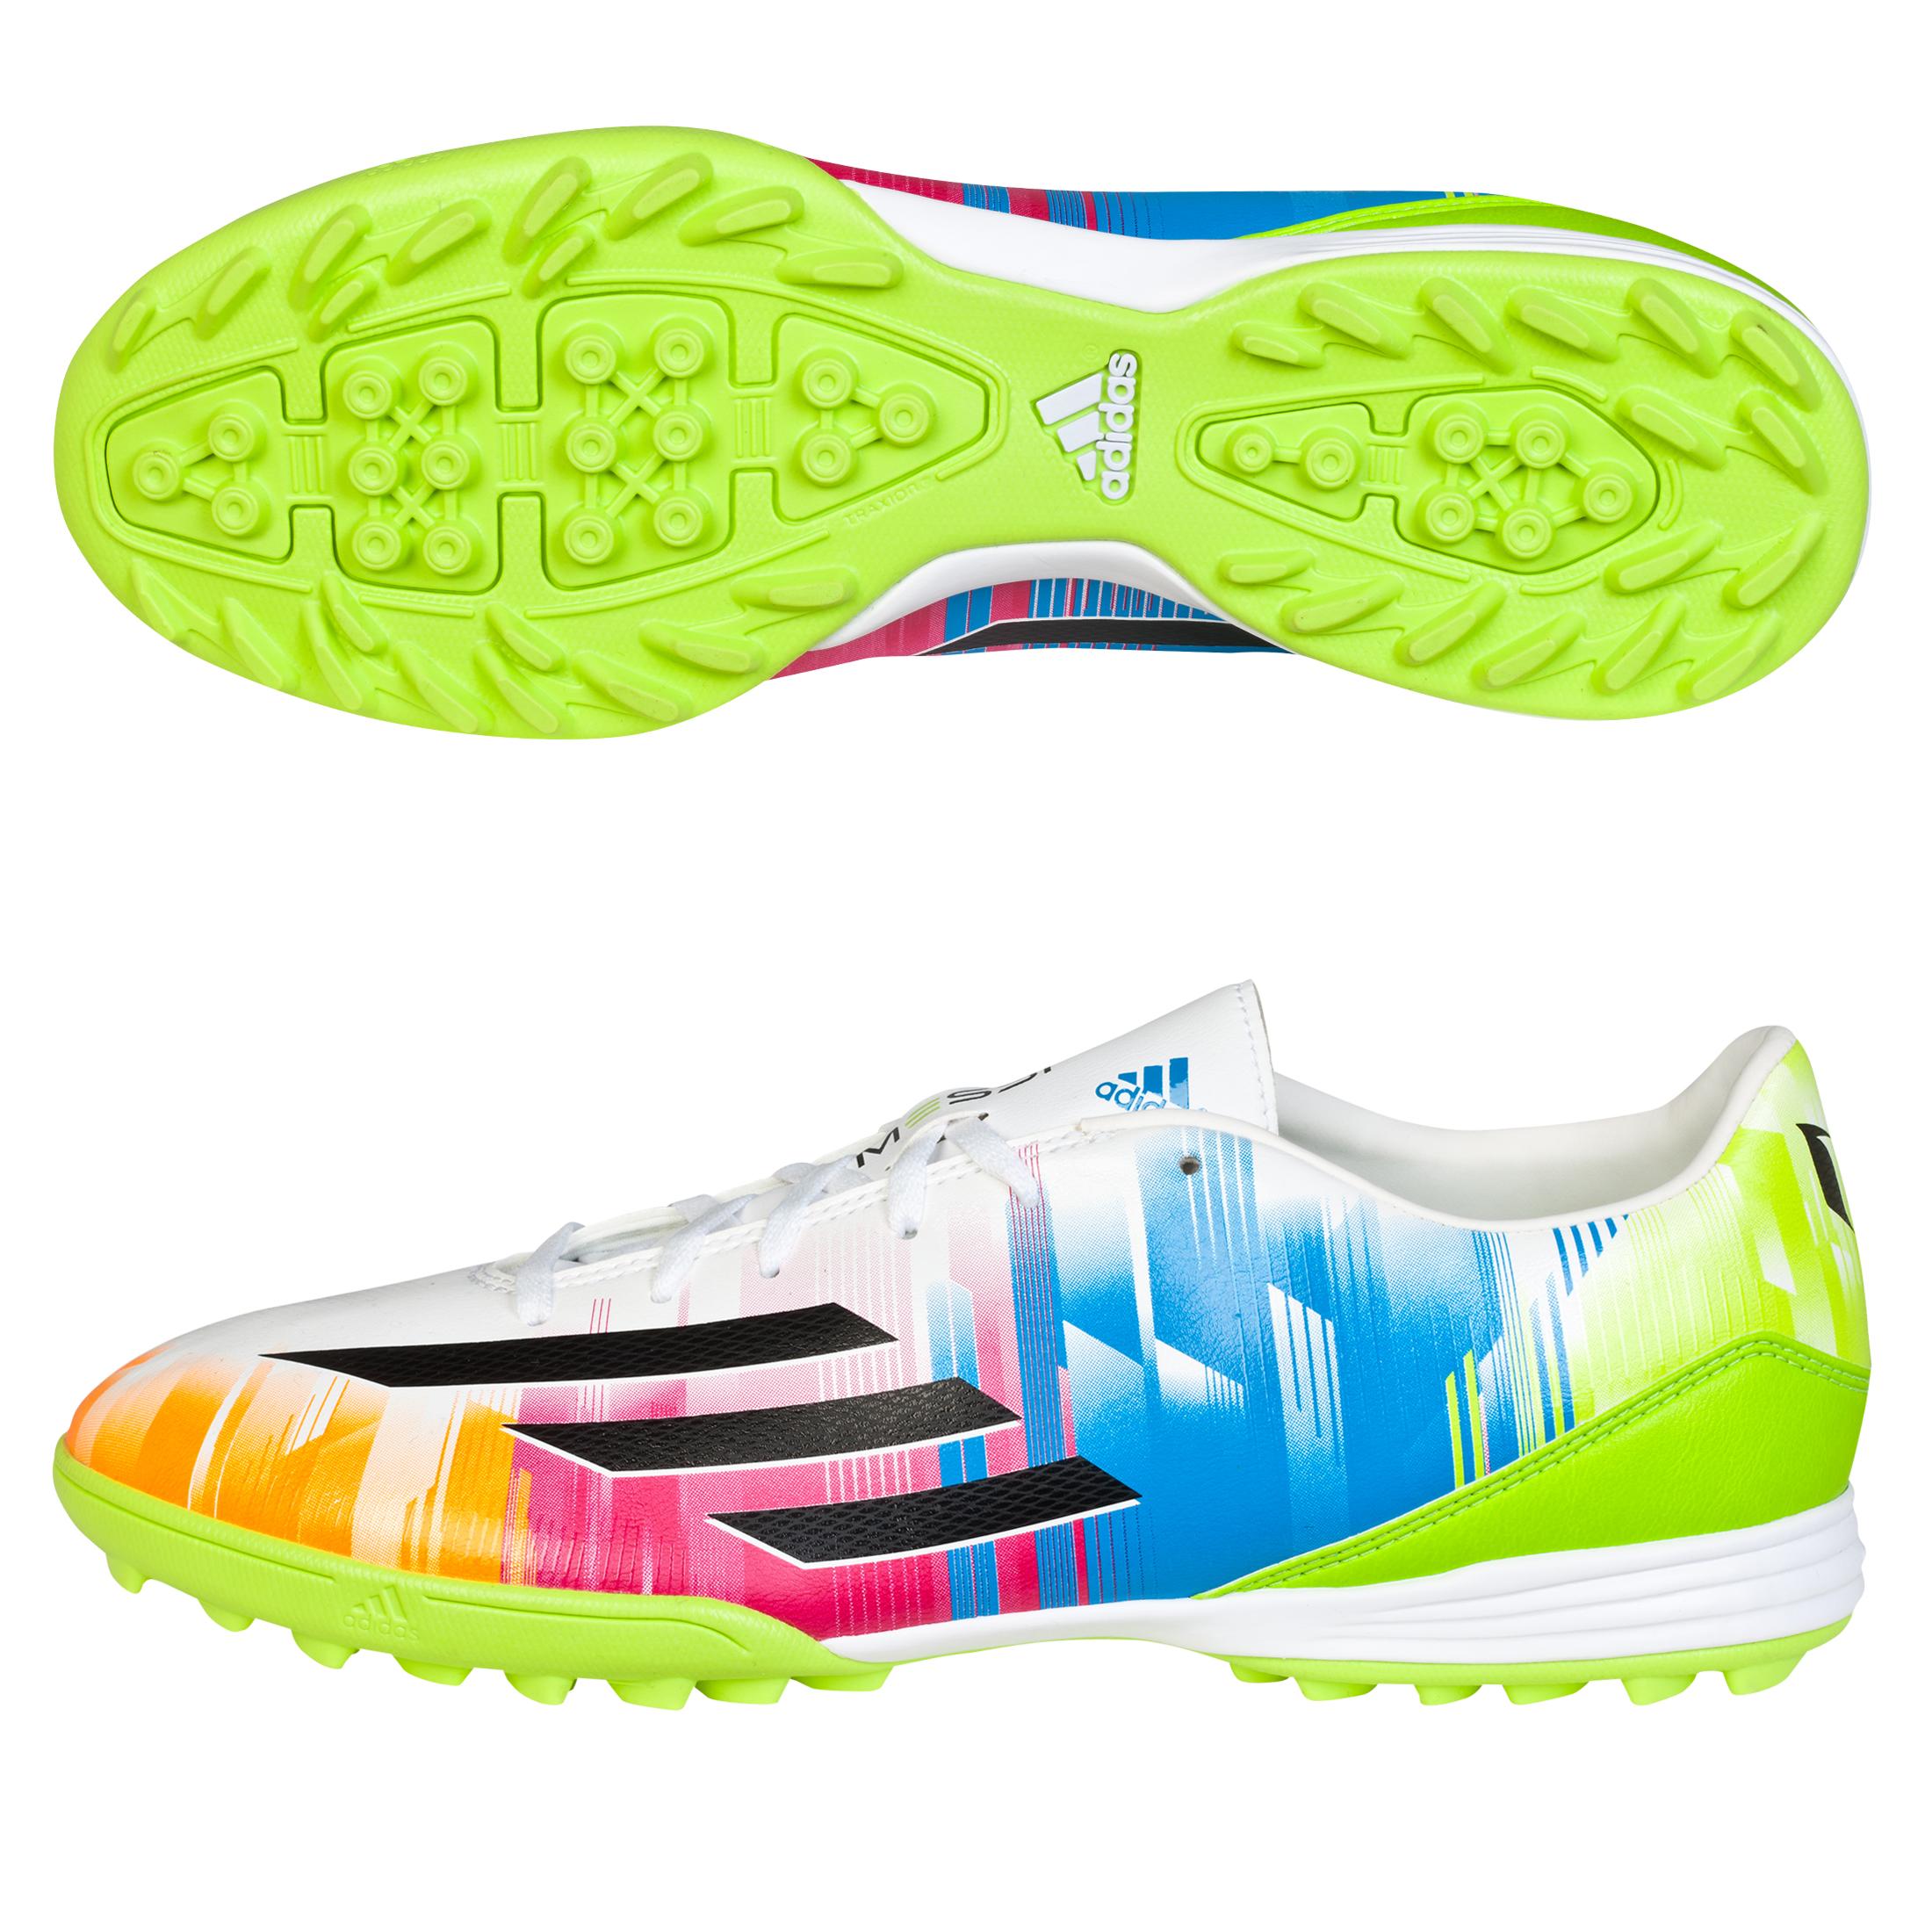 Adidas F10 Messi TRX Astroturf White